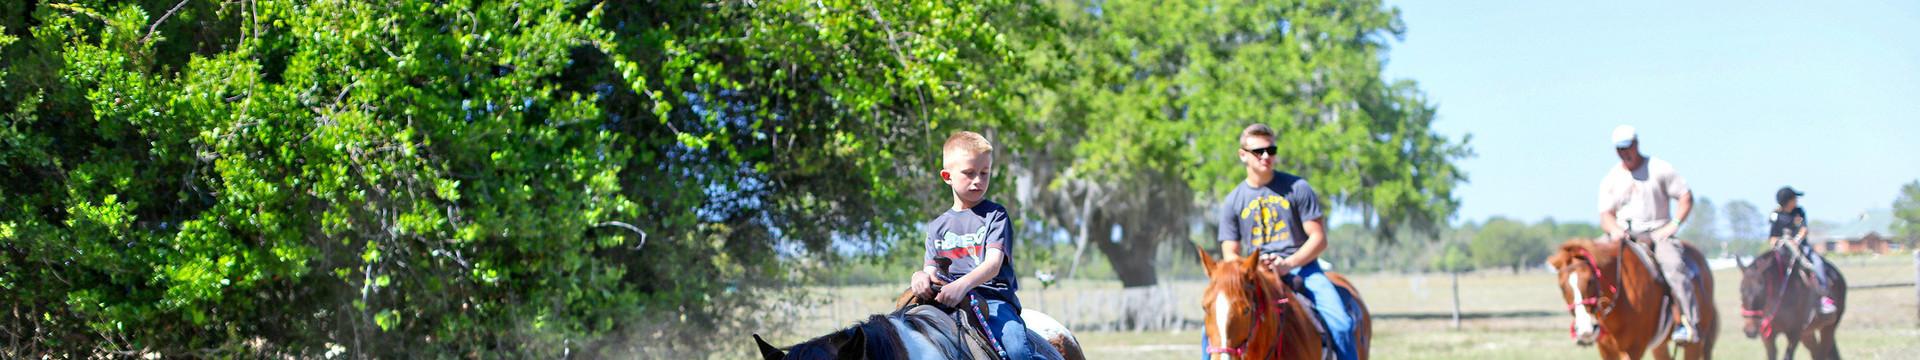 Horseback riding - Westgate River Ranch